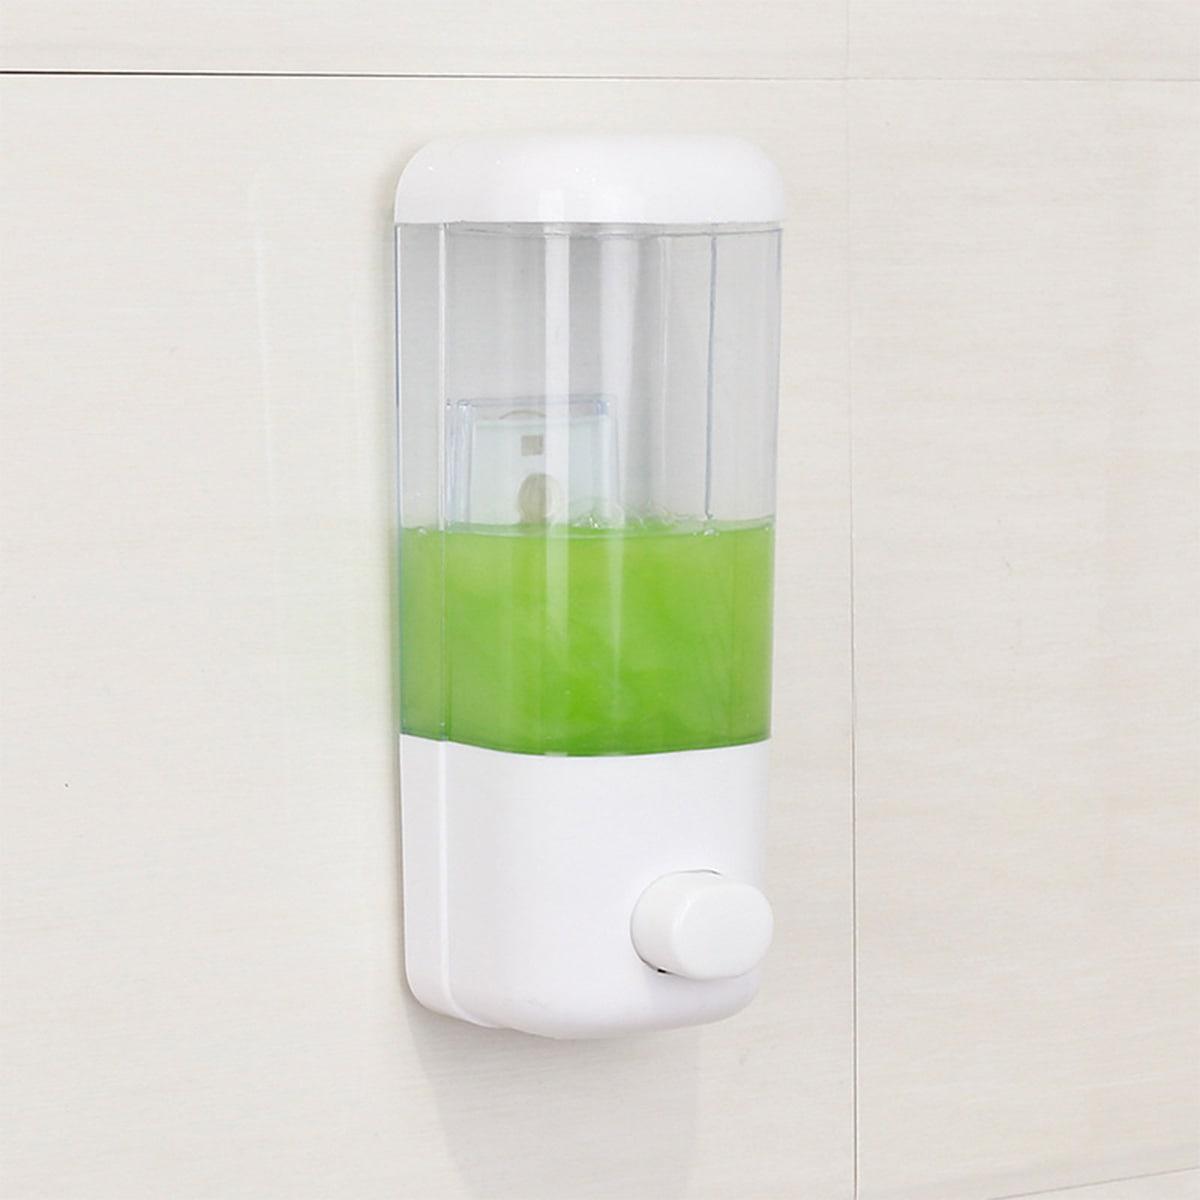 Wandmontage zeepdispenser